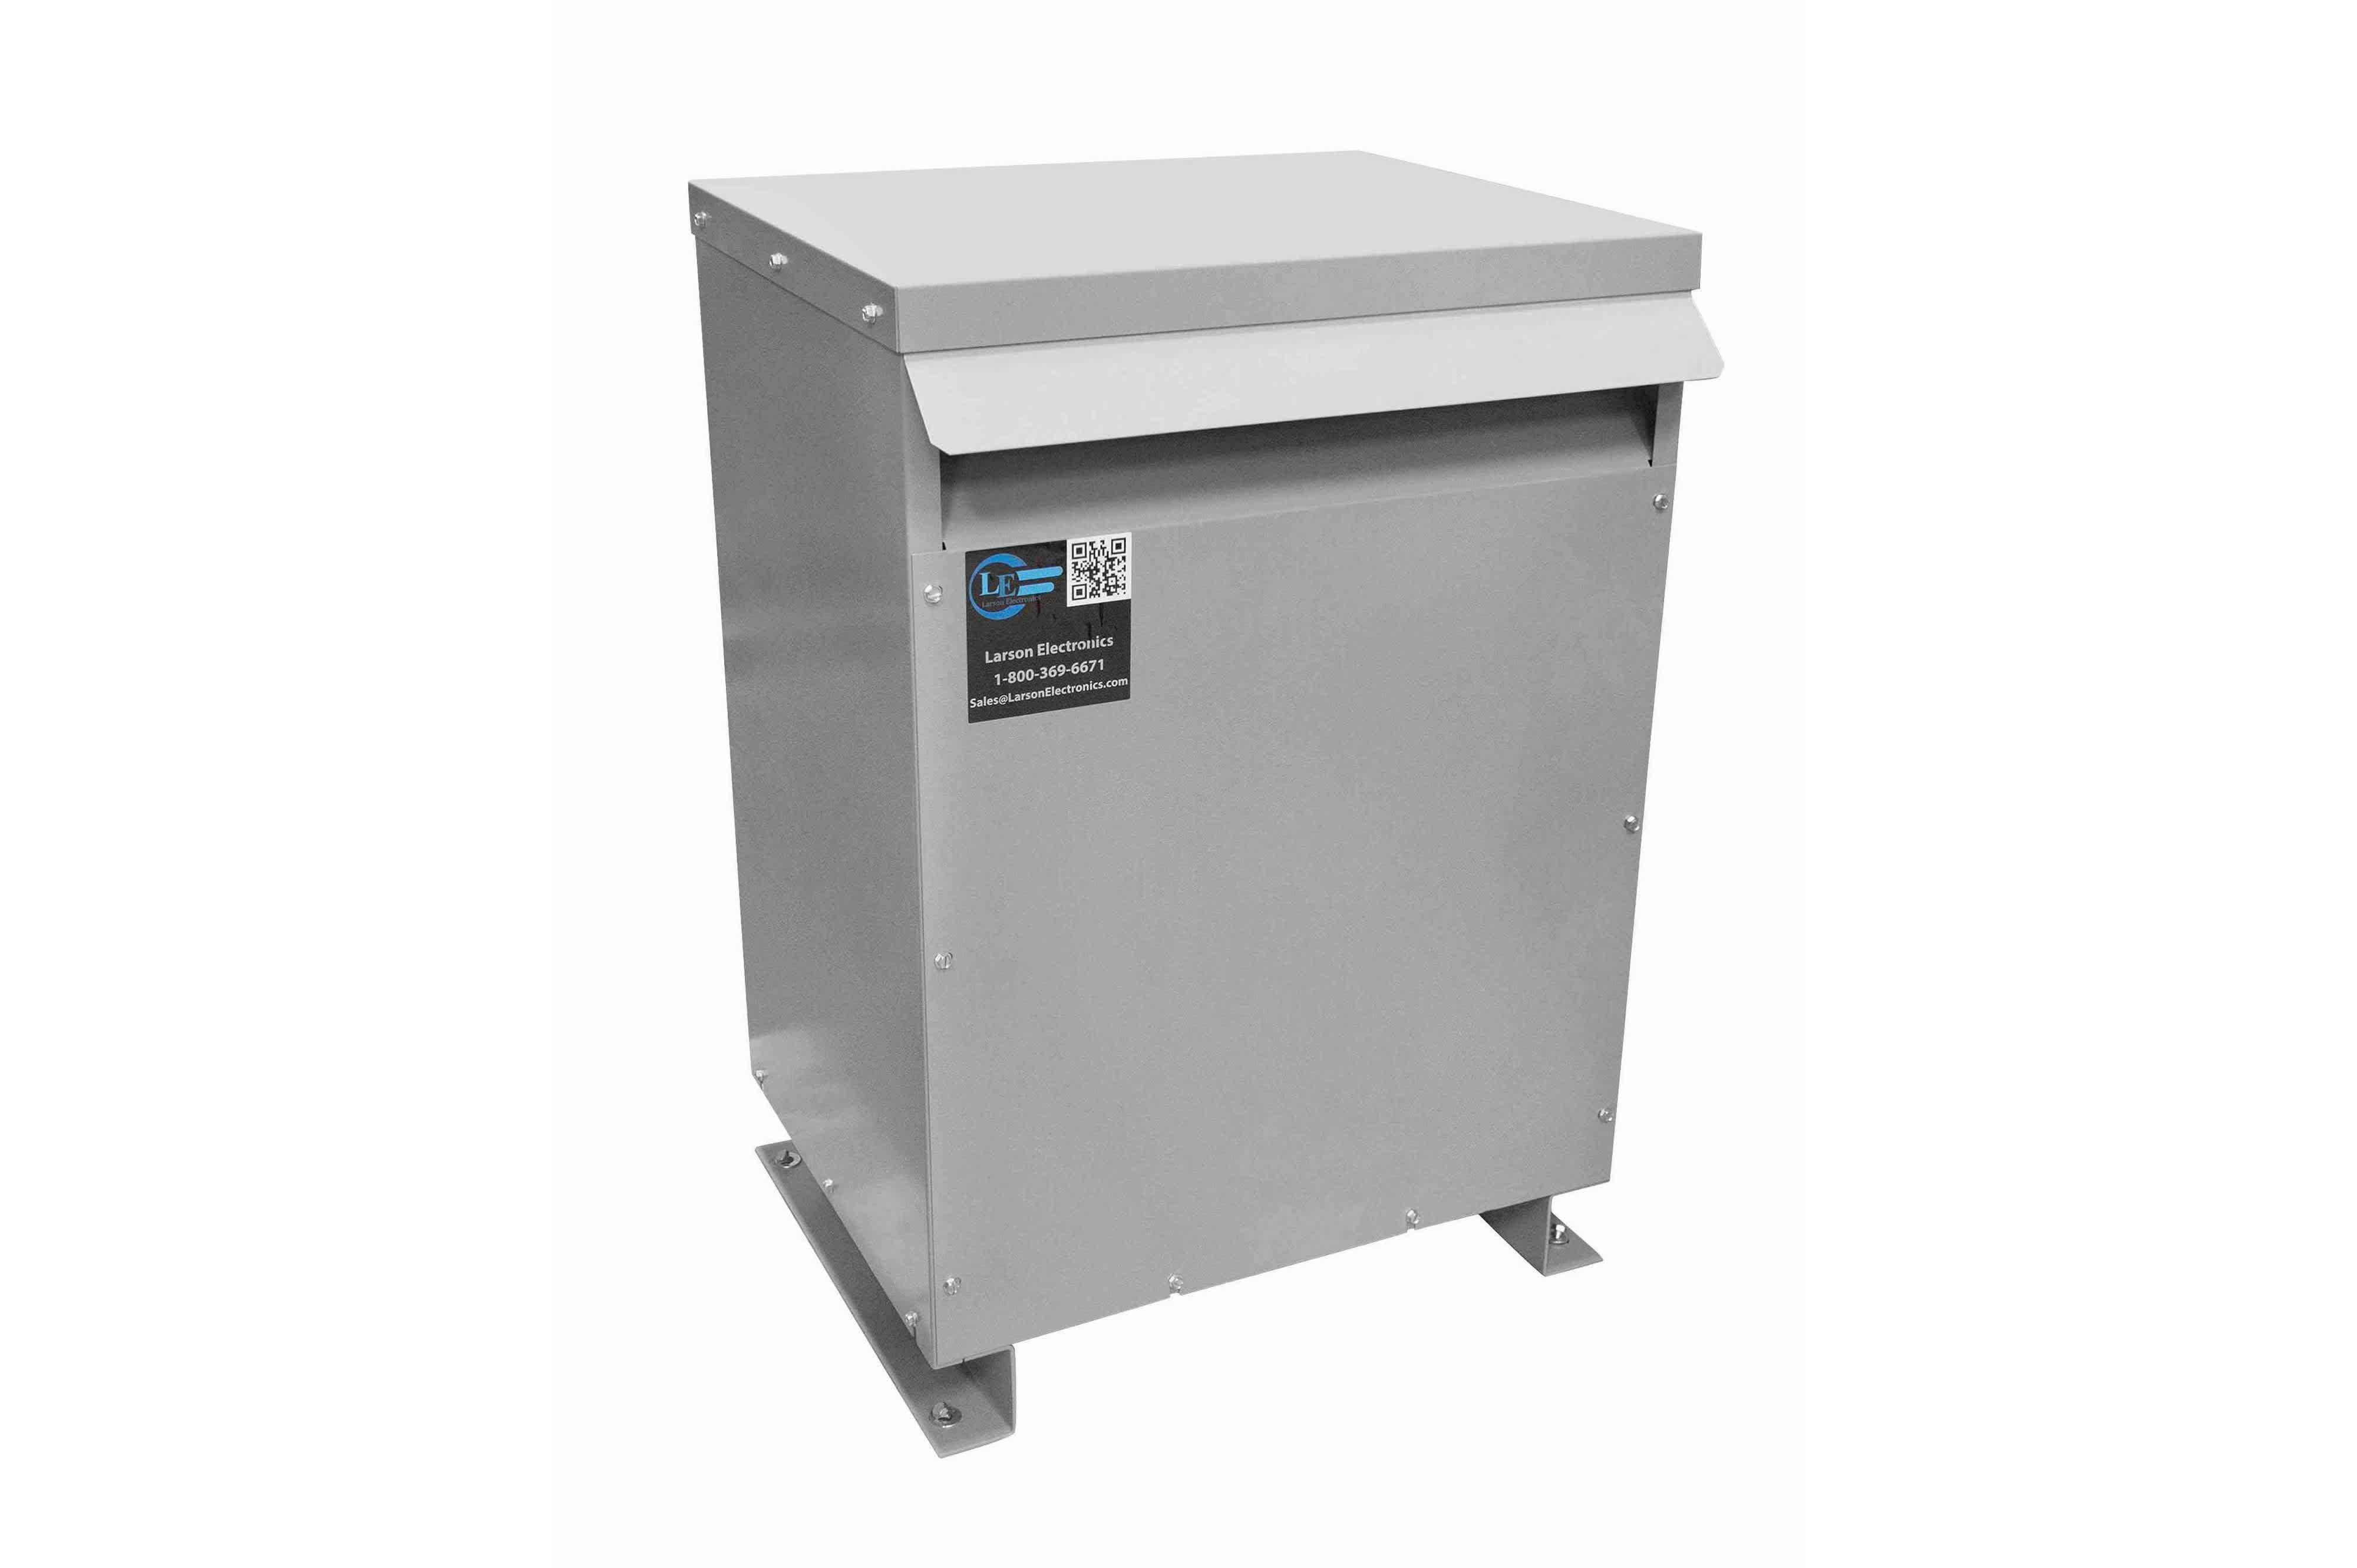 800 kVA 3PH Isolation Transformer, 575V Wye Primary, 208Y/120 Wye-N Secondary, N3R, Ventilated, 60 Hz